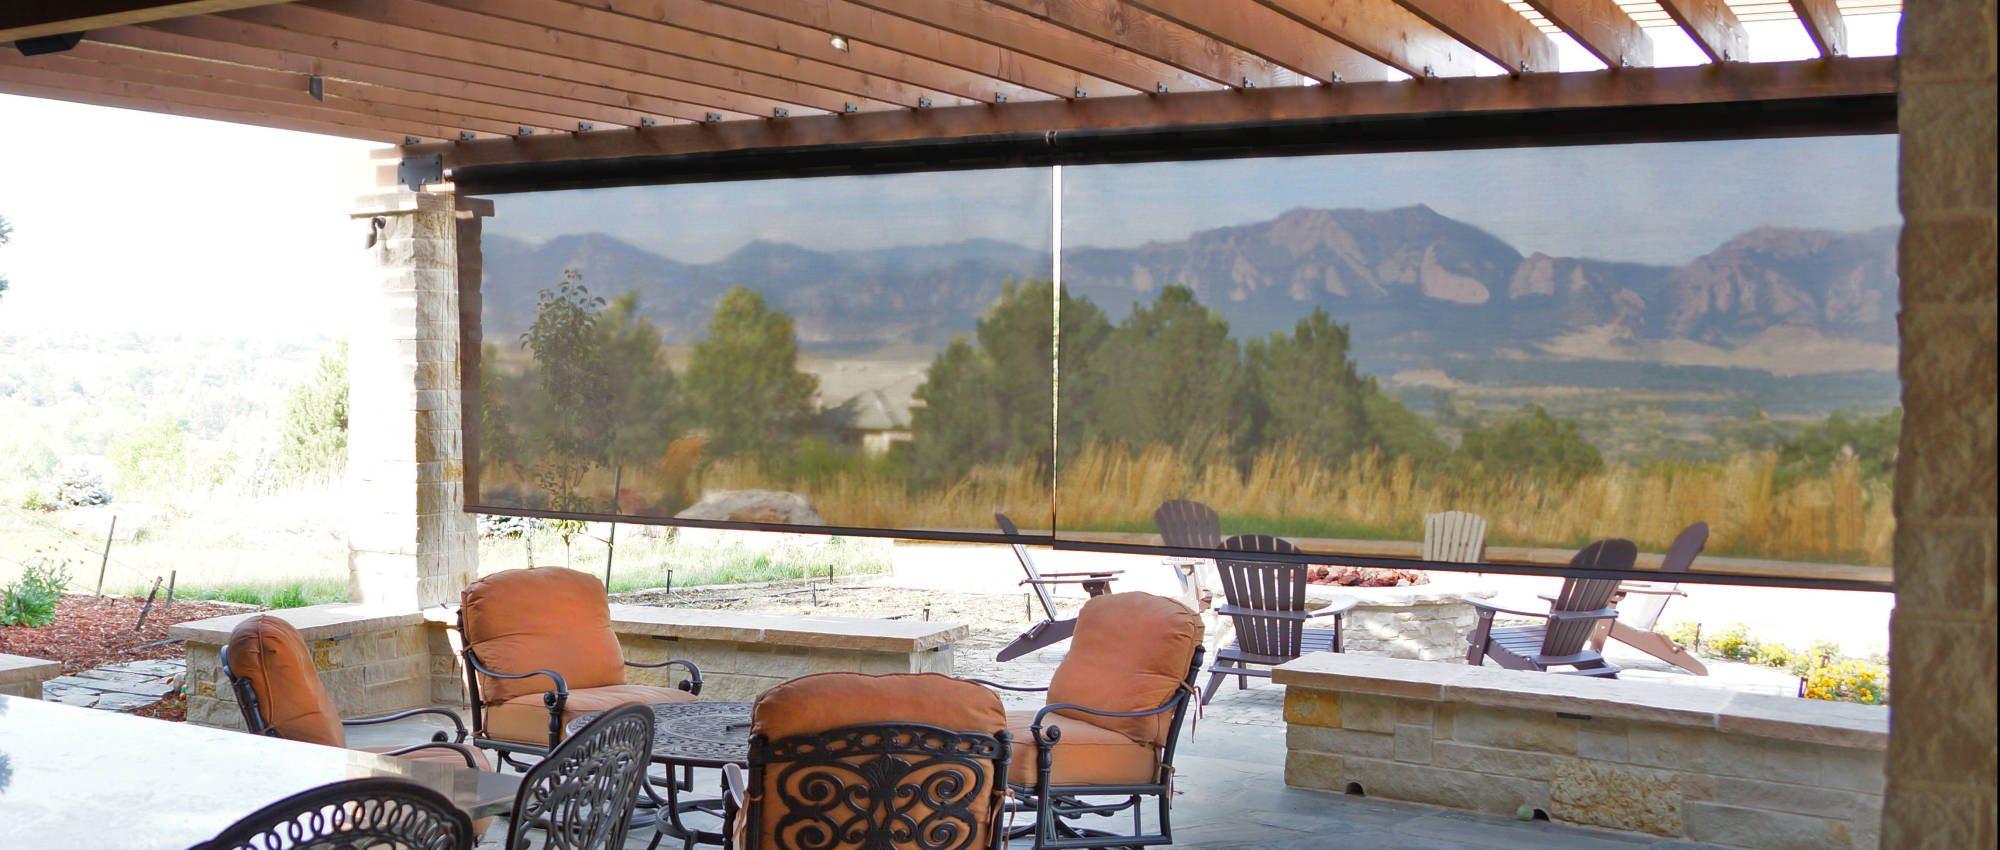 insolroll oasis 2600 patio sun shades